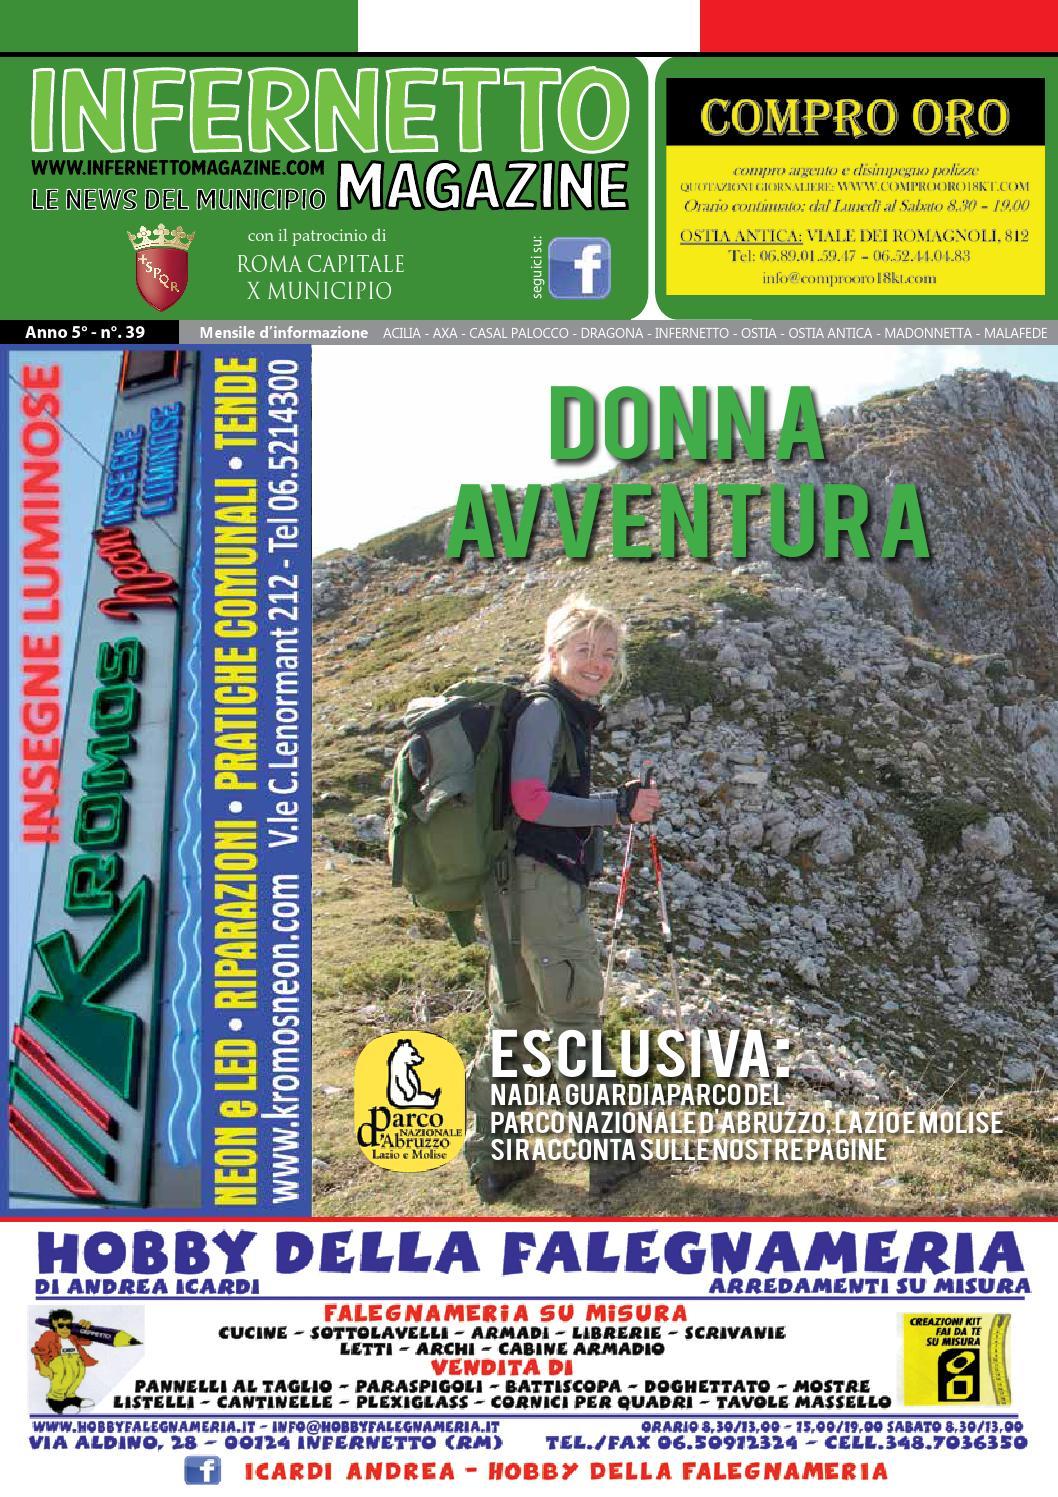 Di Tommaso Arredamenti Ostia infernetto magazine n 39 by esse editore - issuu